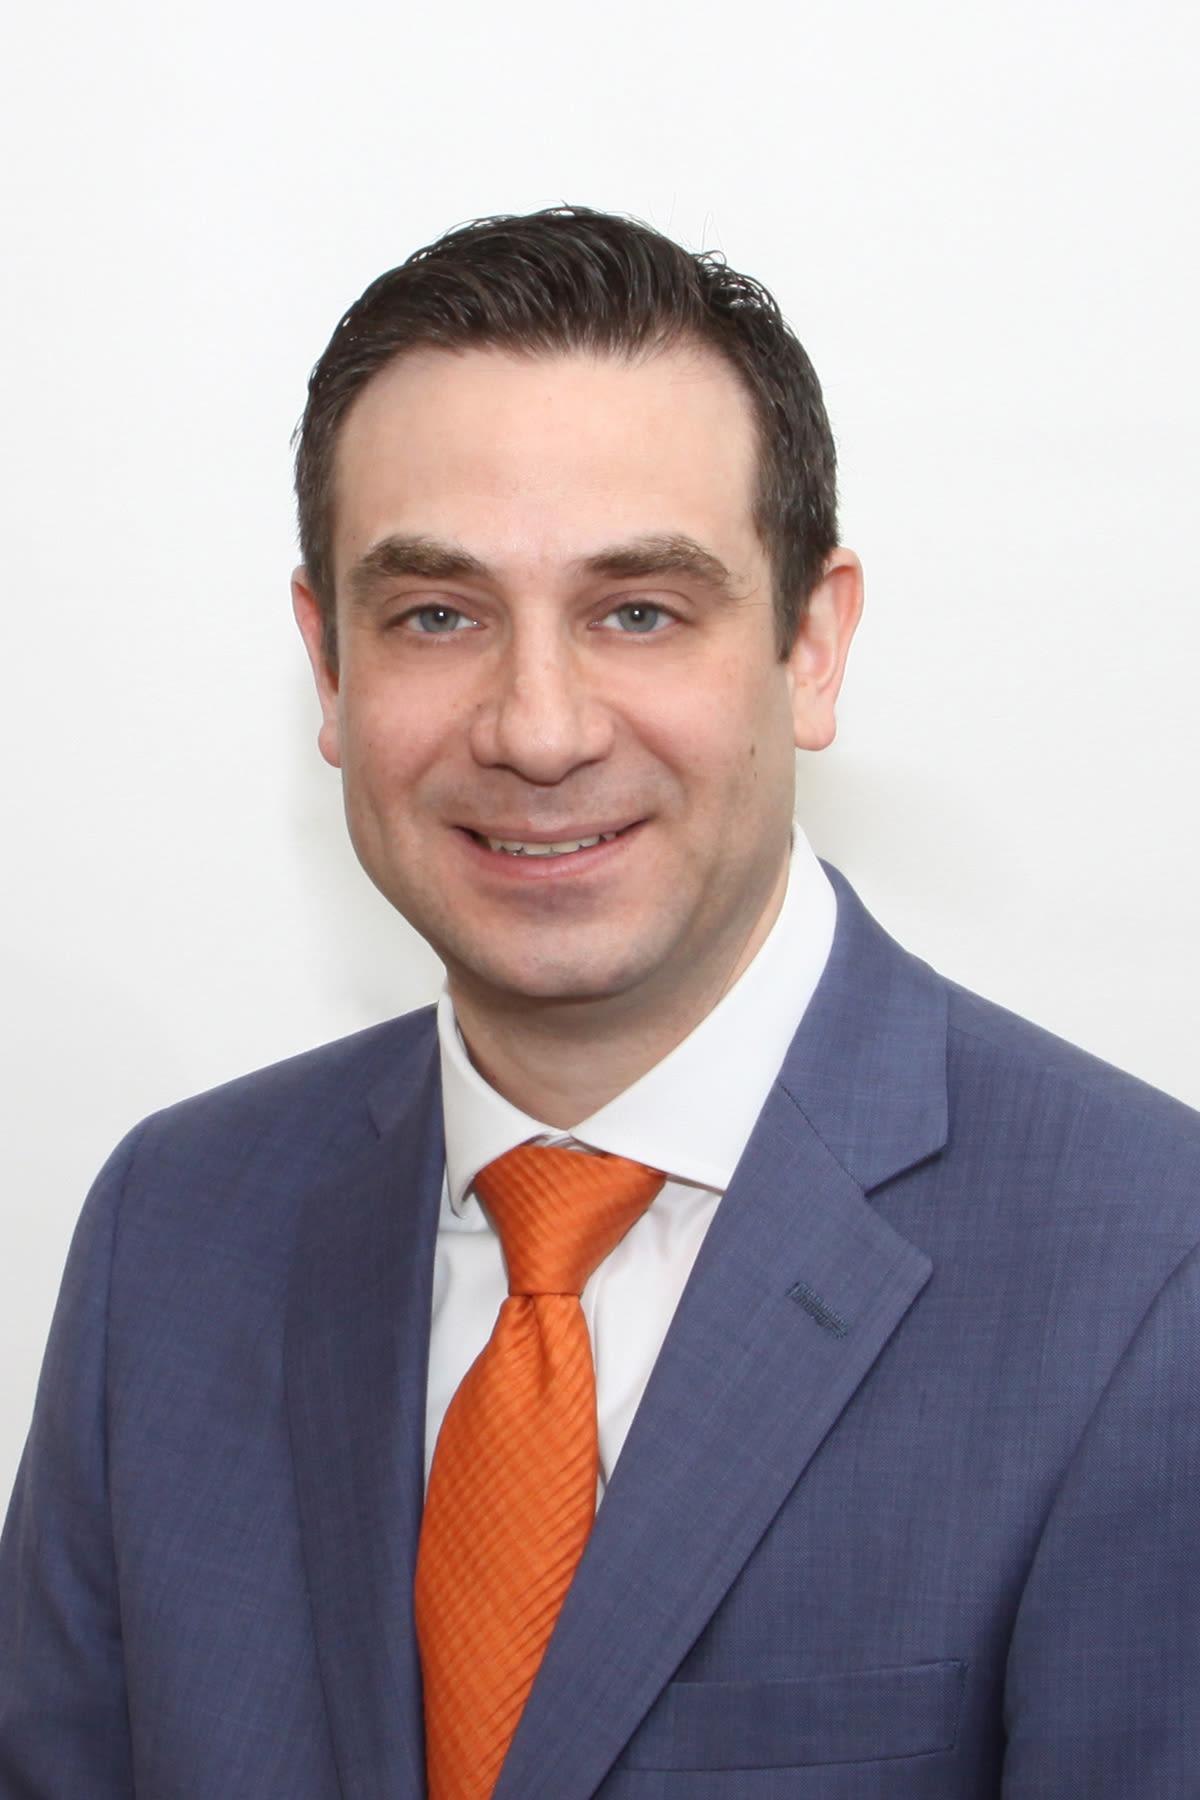 Jeremy Crane, Executive Vice President